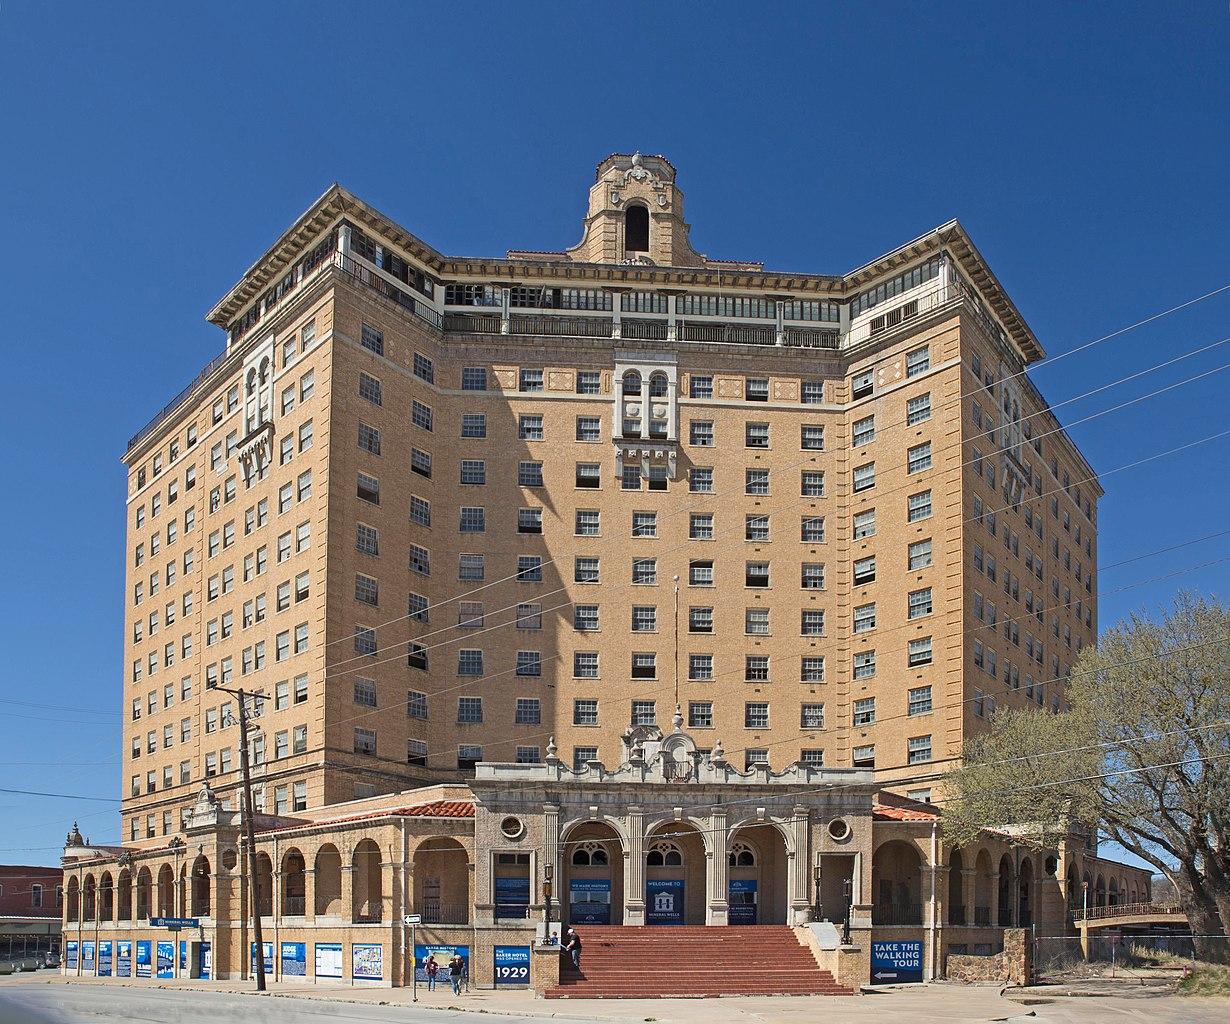 Baker Hotel in Texas